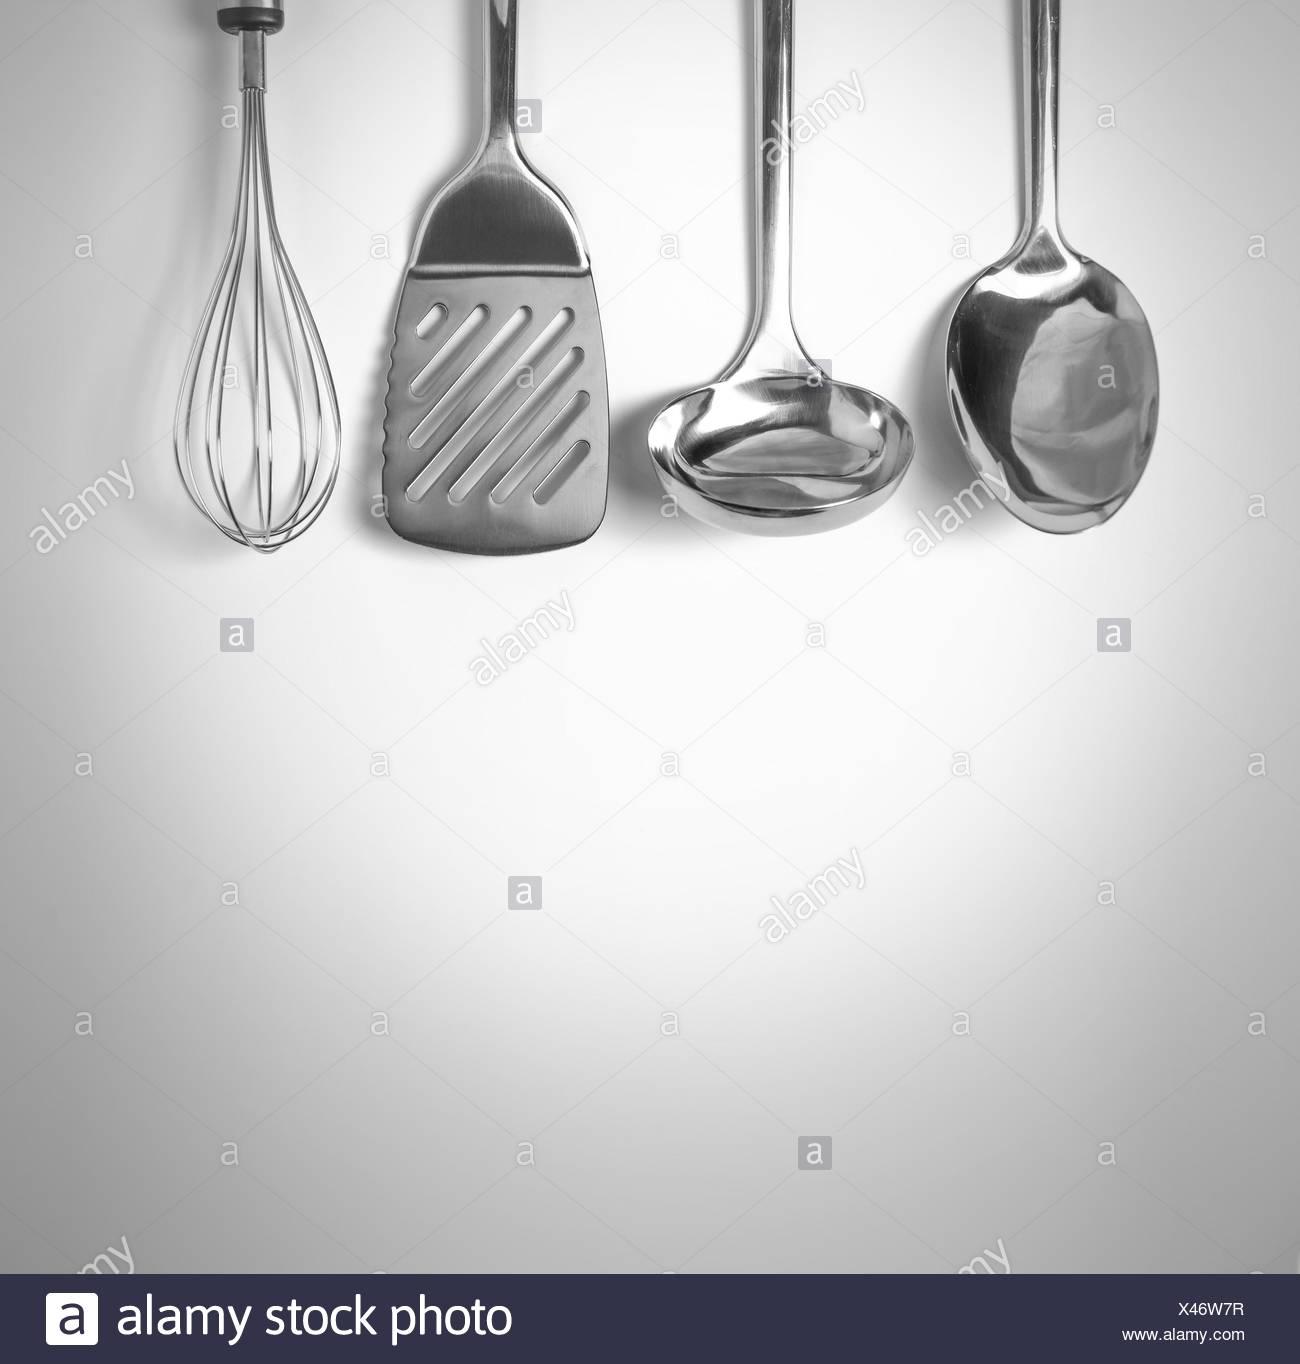 kitchen utensils background kitchen cleaning kitchen tools background stock photo 277976043 alamy